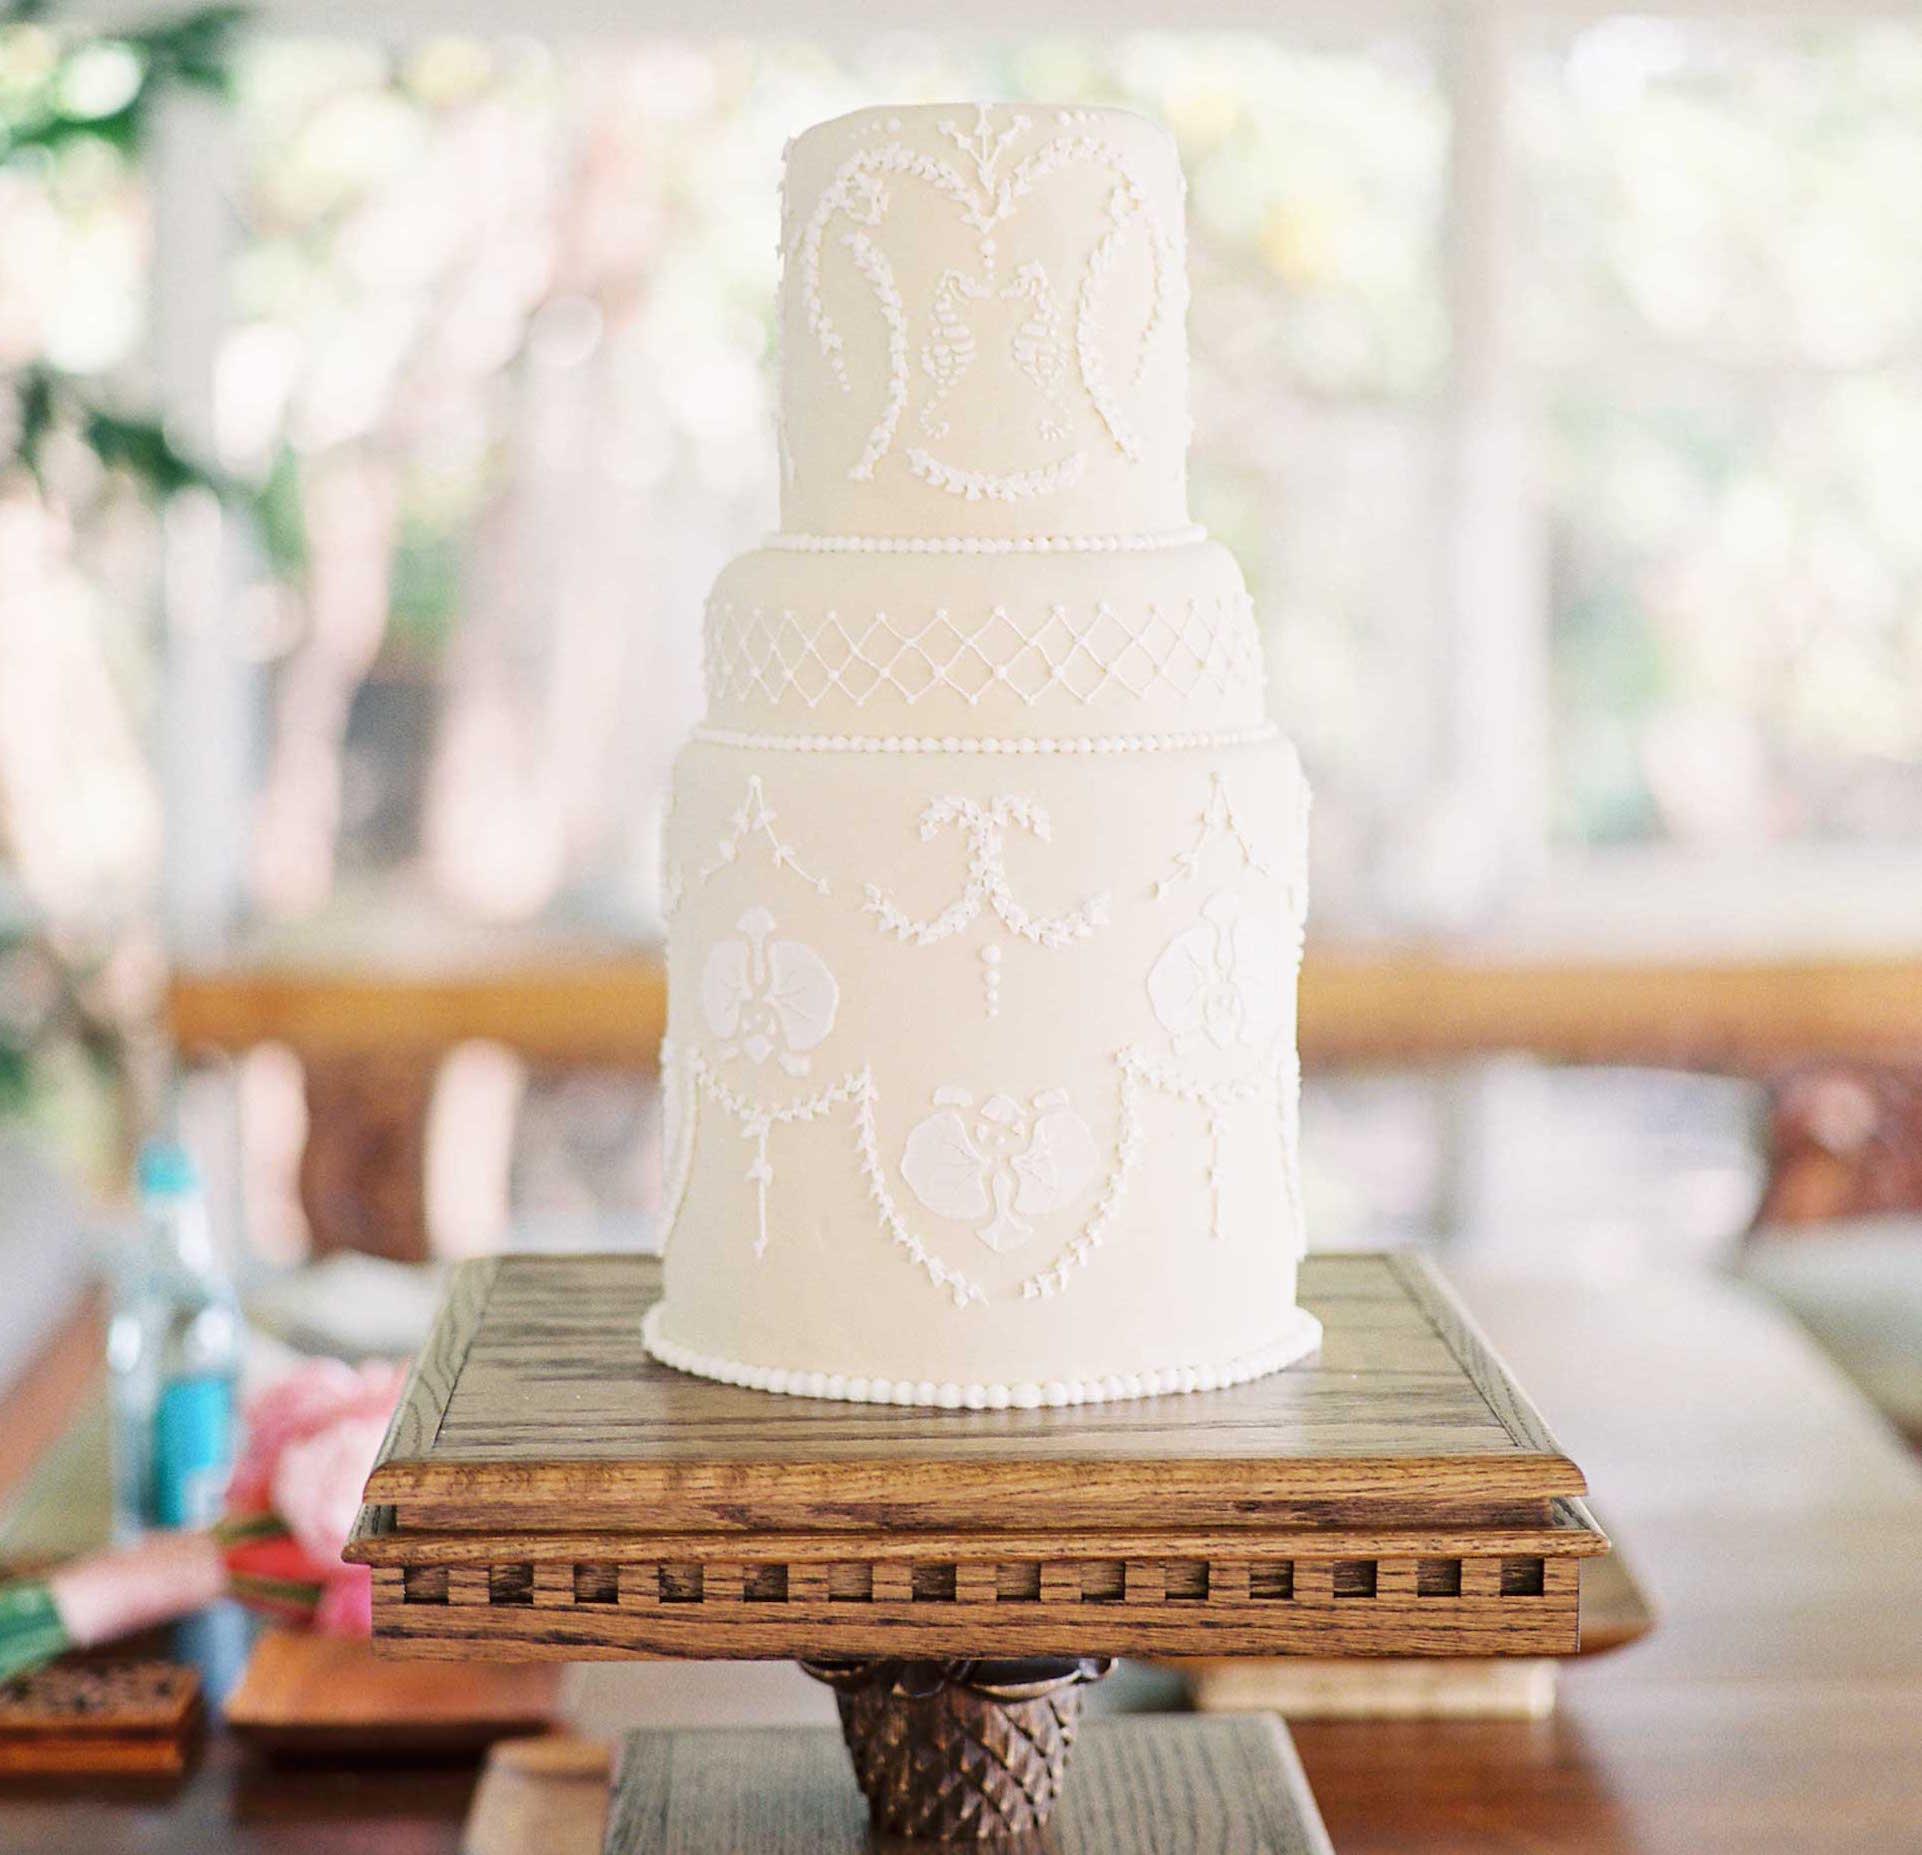 Tropical wedding simple small wedding cake